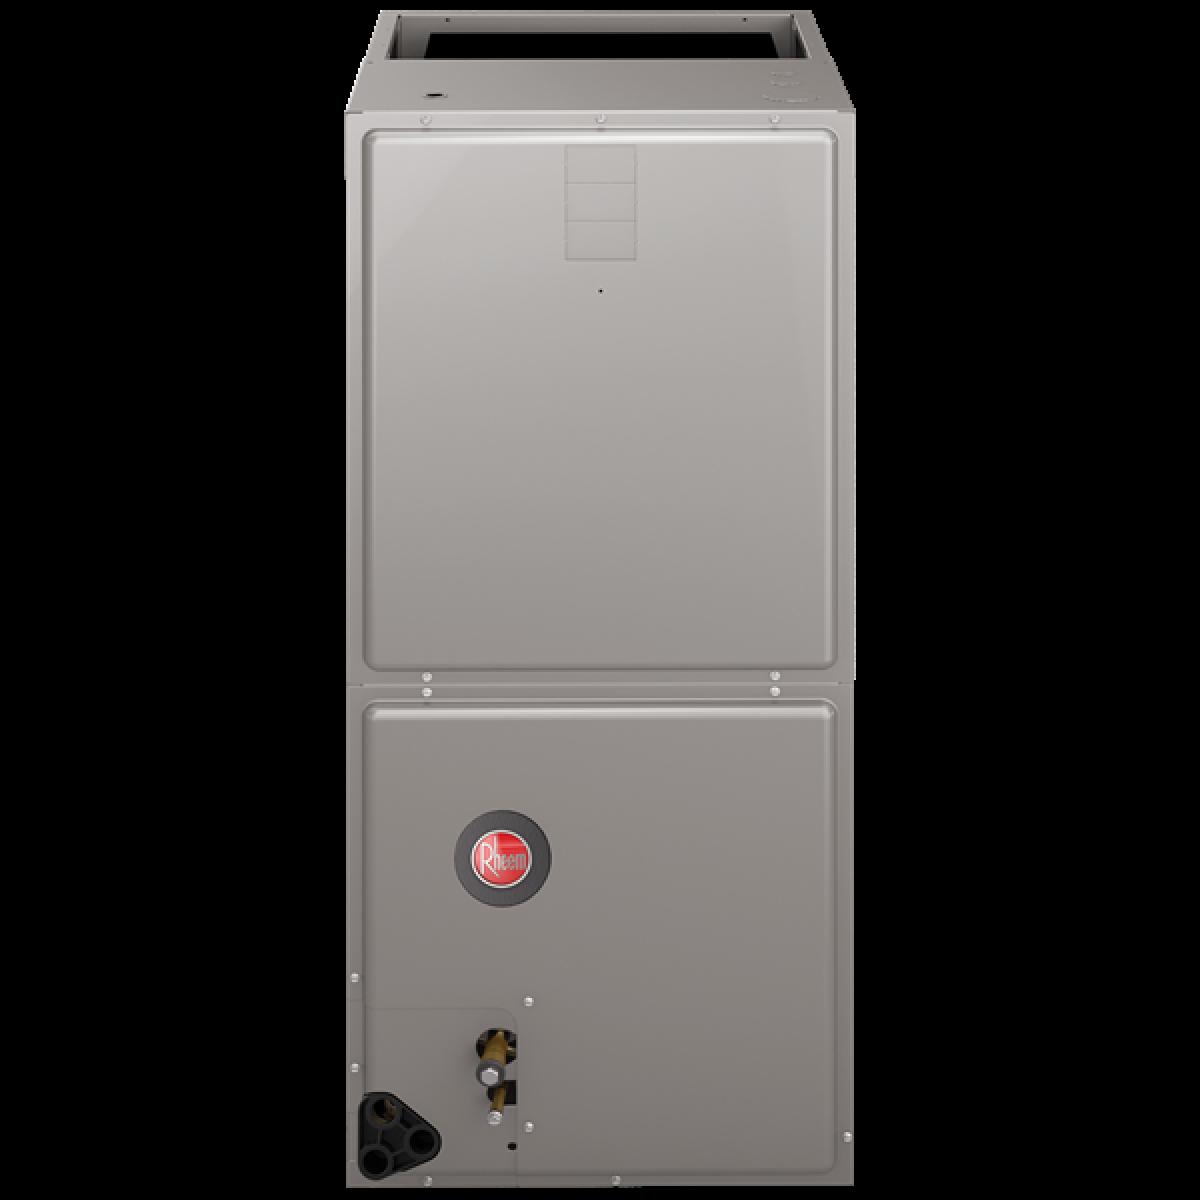 Rheem Electric Heat Best Secret Wiring Diagram Strips 16 Seer 3 0 Ton System Single Stage Pump Reviews Strip